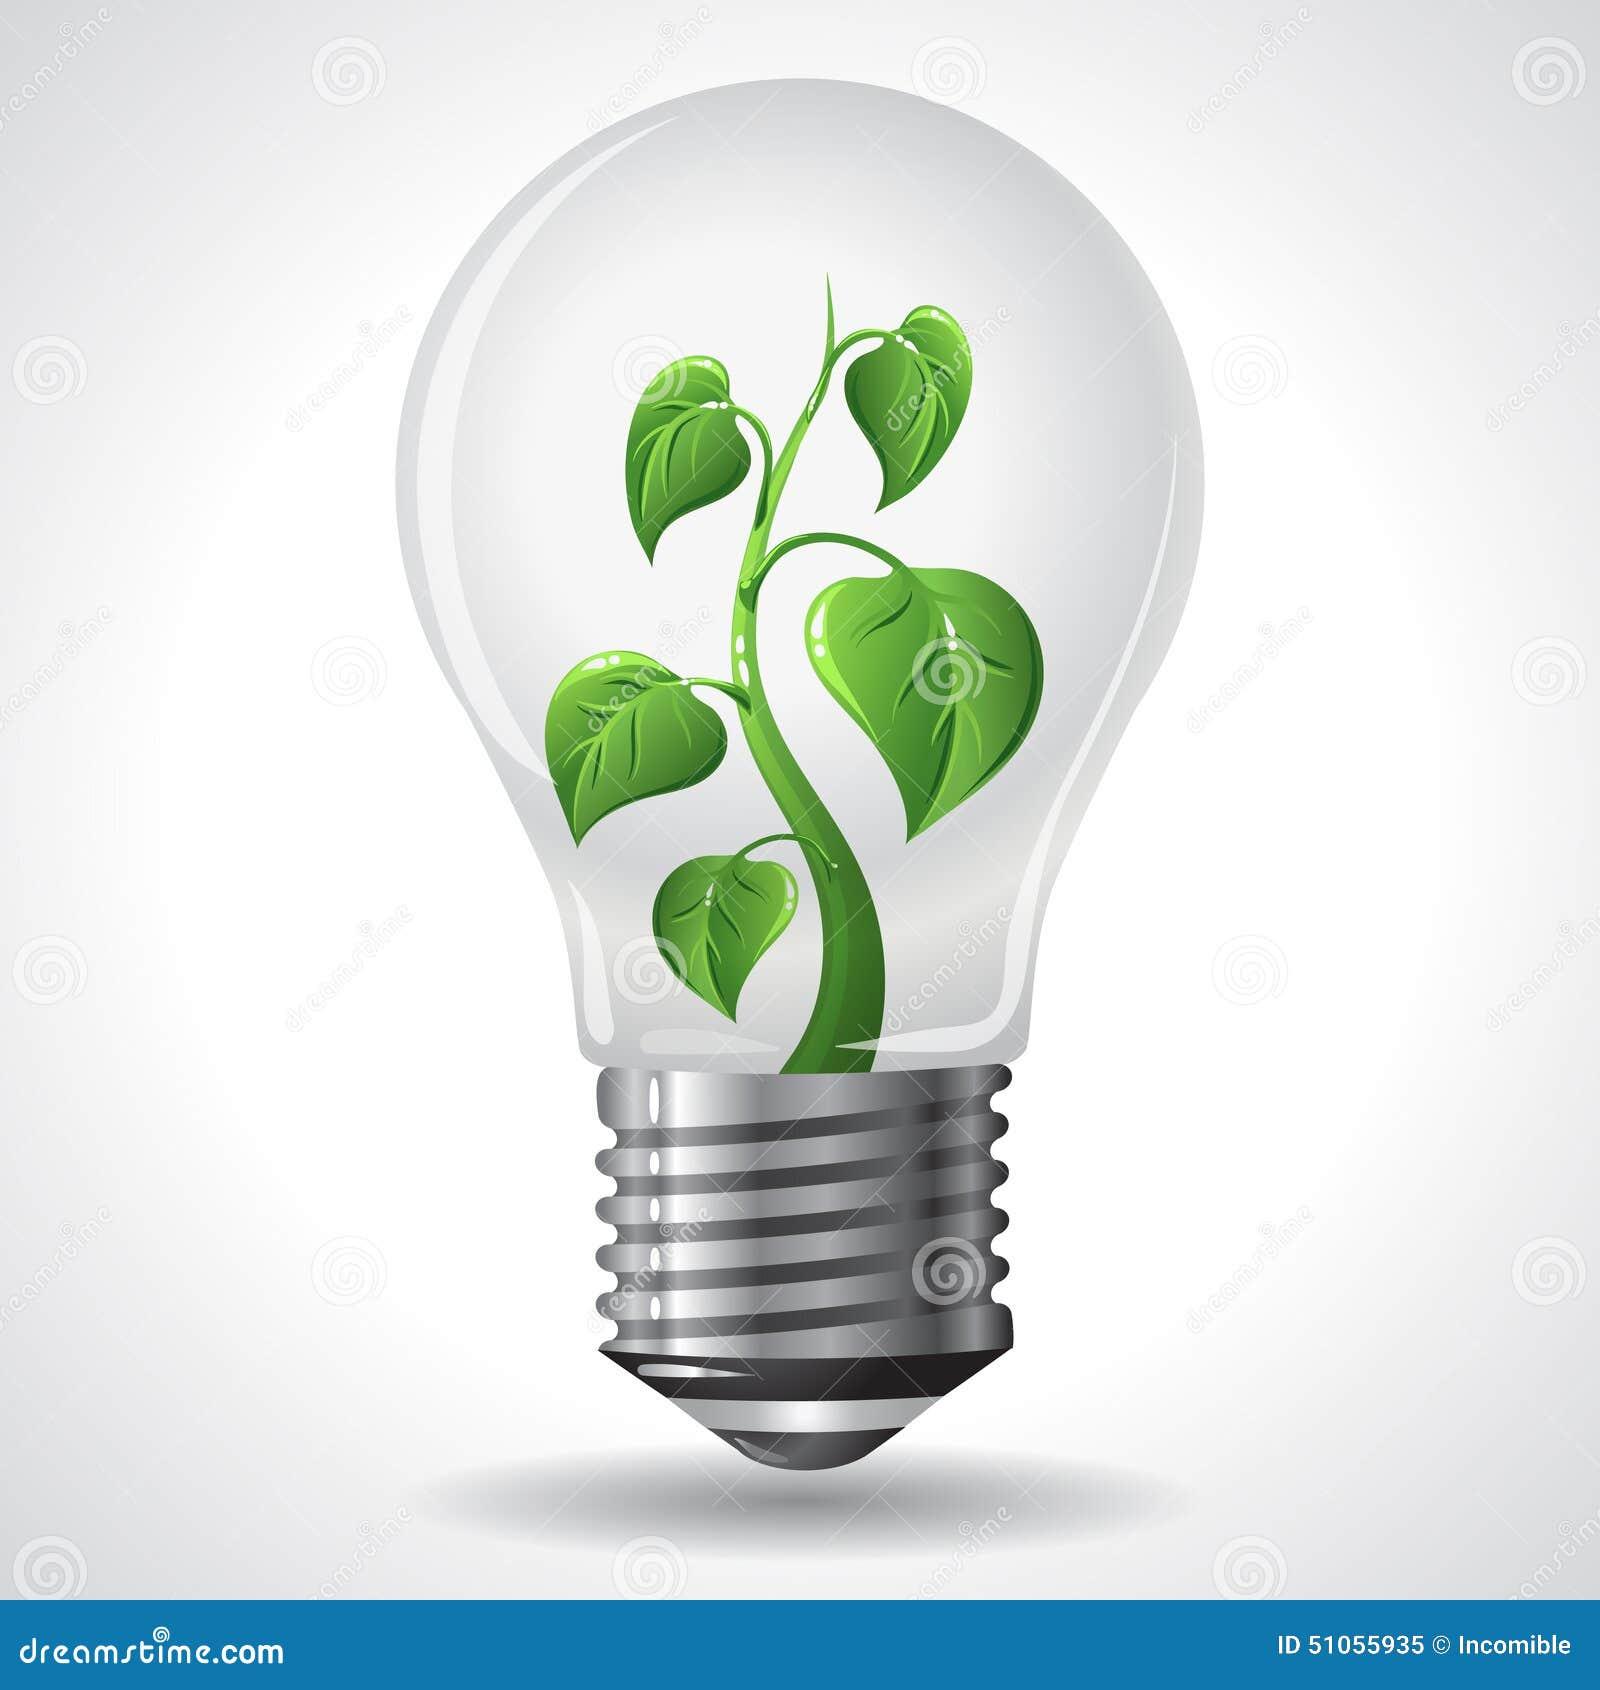 Green Energy Concept Power Saving Light Bulbs Stock Vector Image 51055935